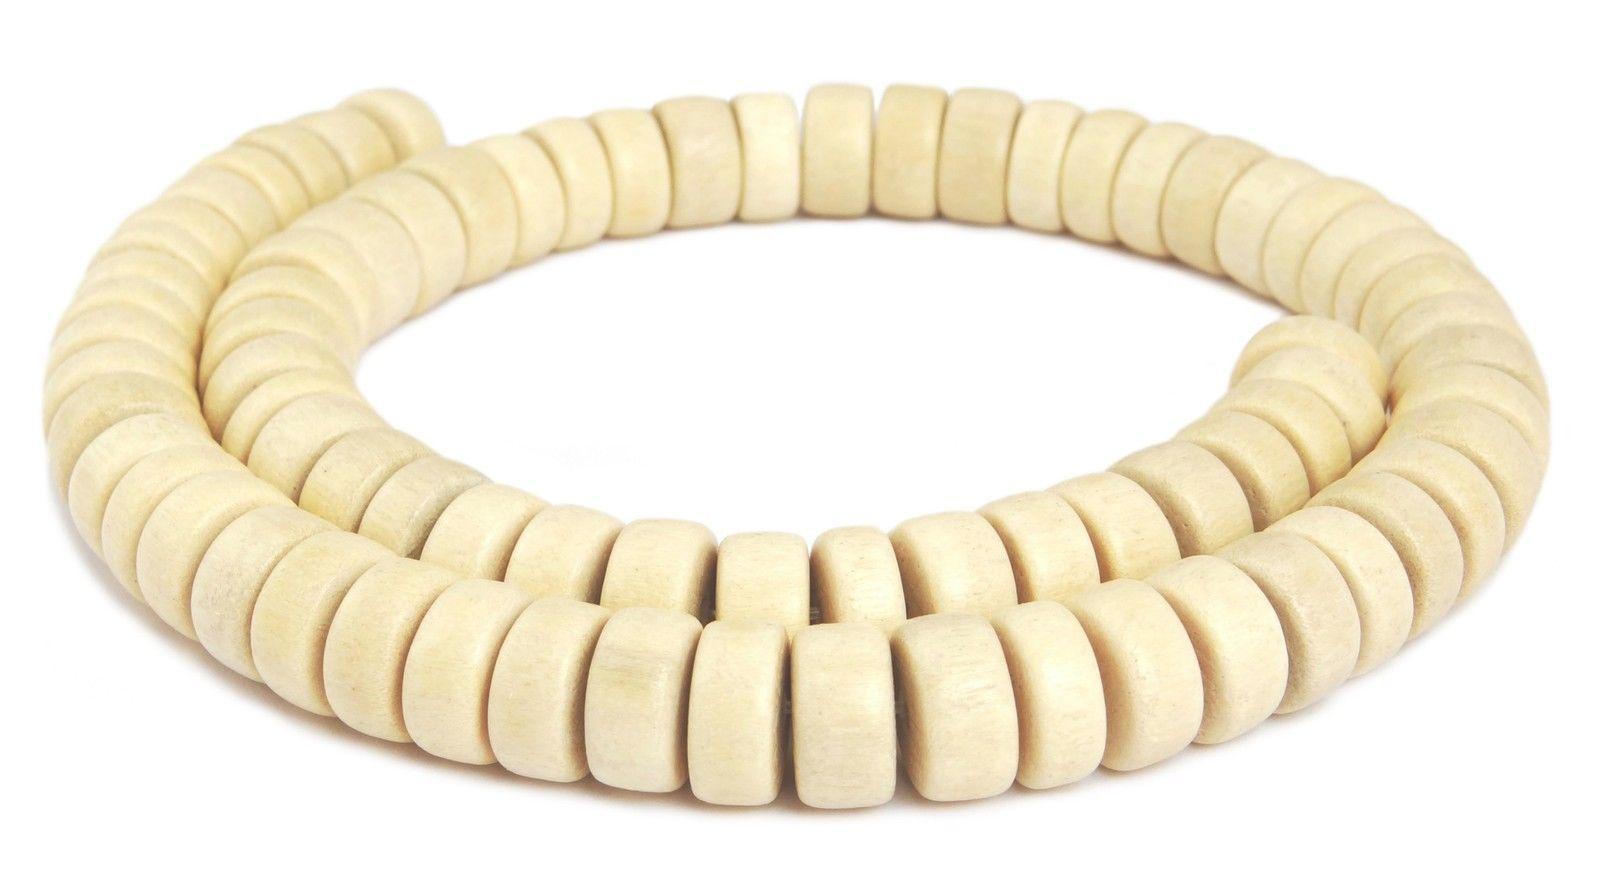 8x3 mm Holzperlen Strang Naturperlen H.GO-12 Goldregenholz Perlen Räder ca